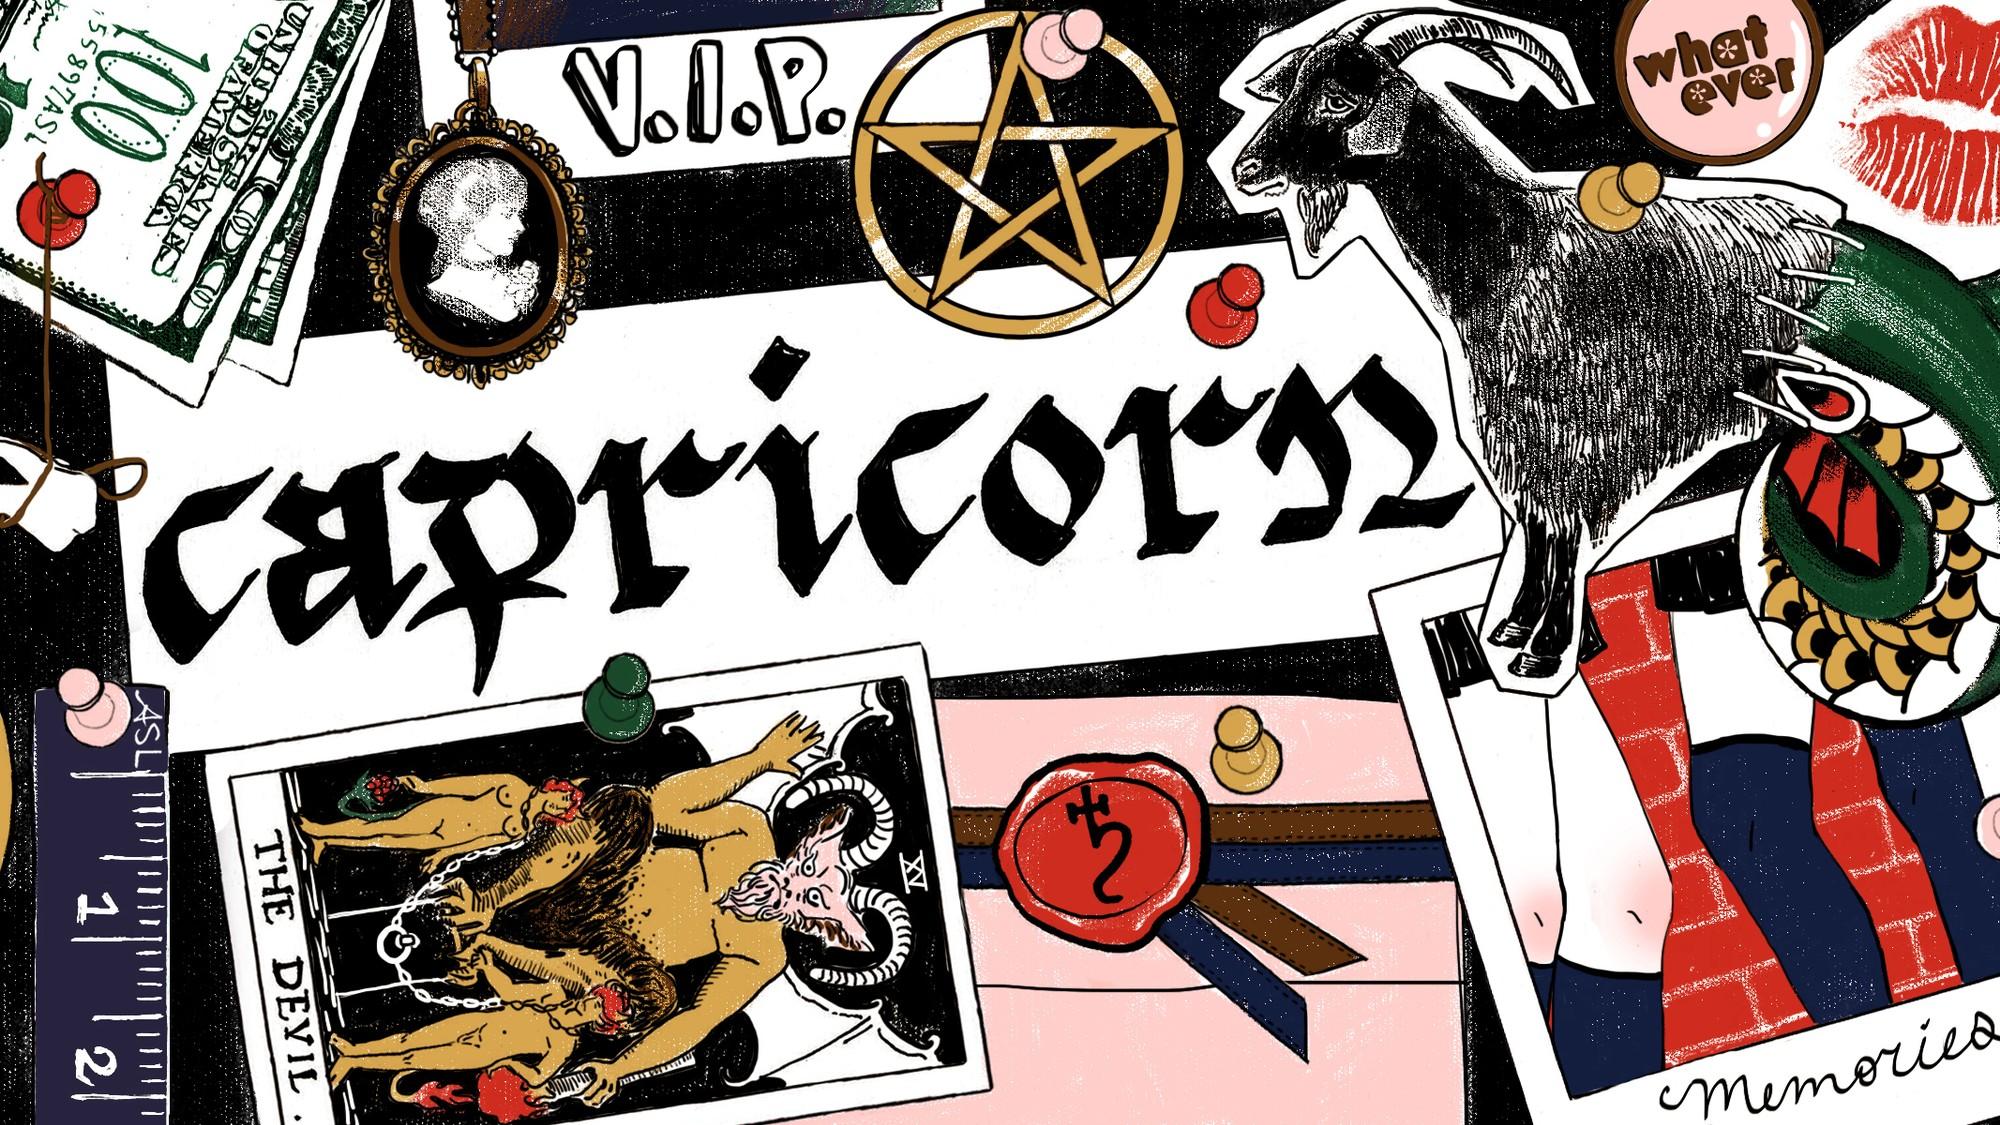 Monthly Horoscope: Capricorn, November 2018 - VICE